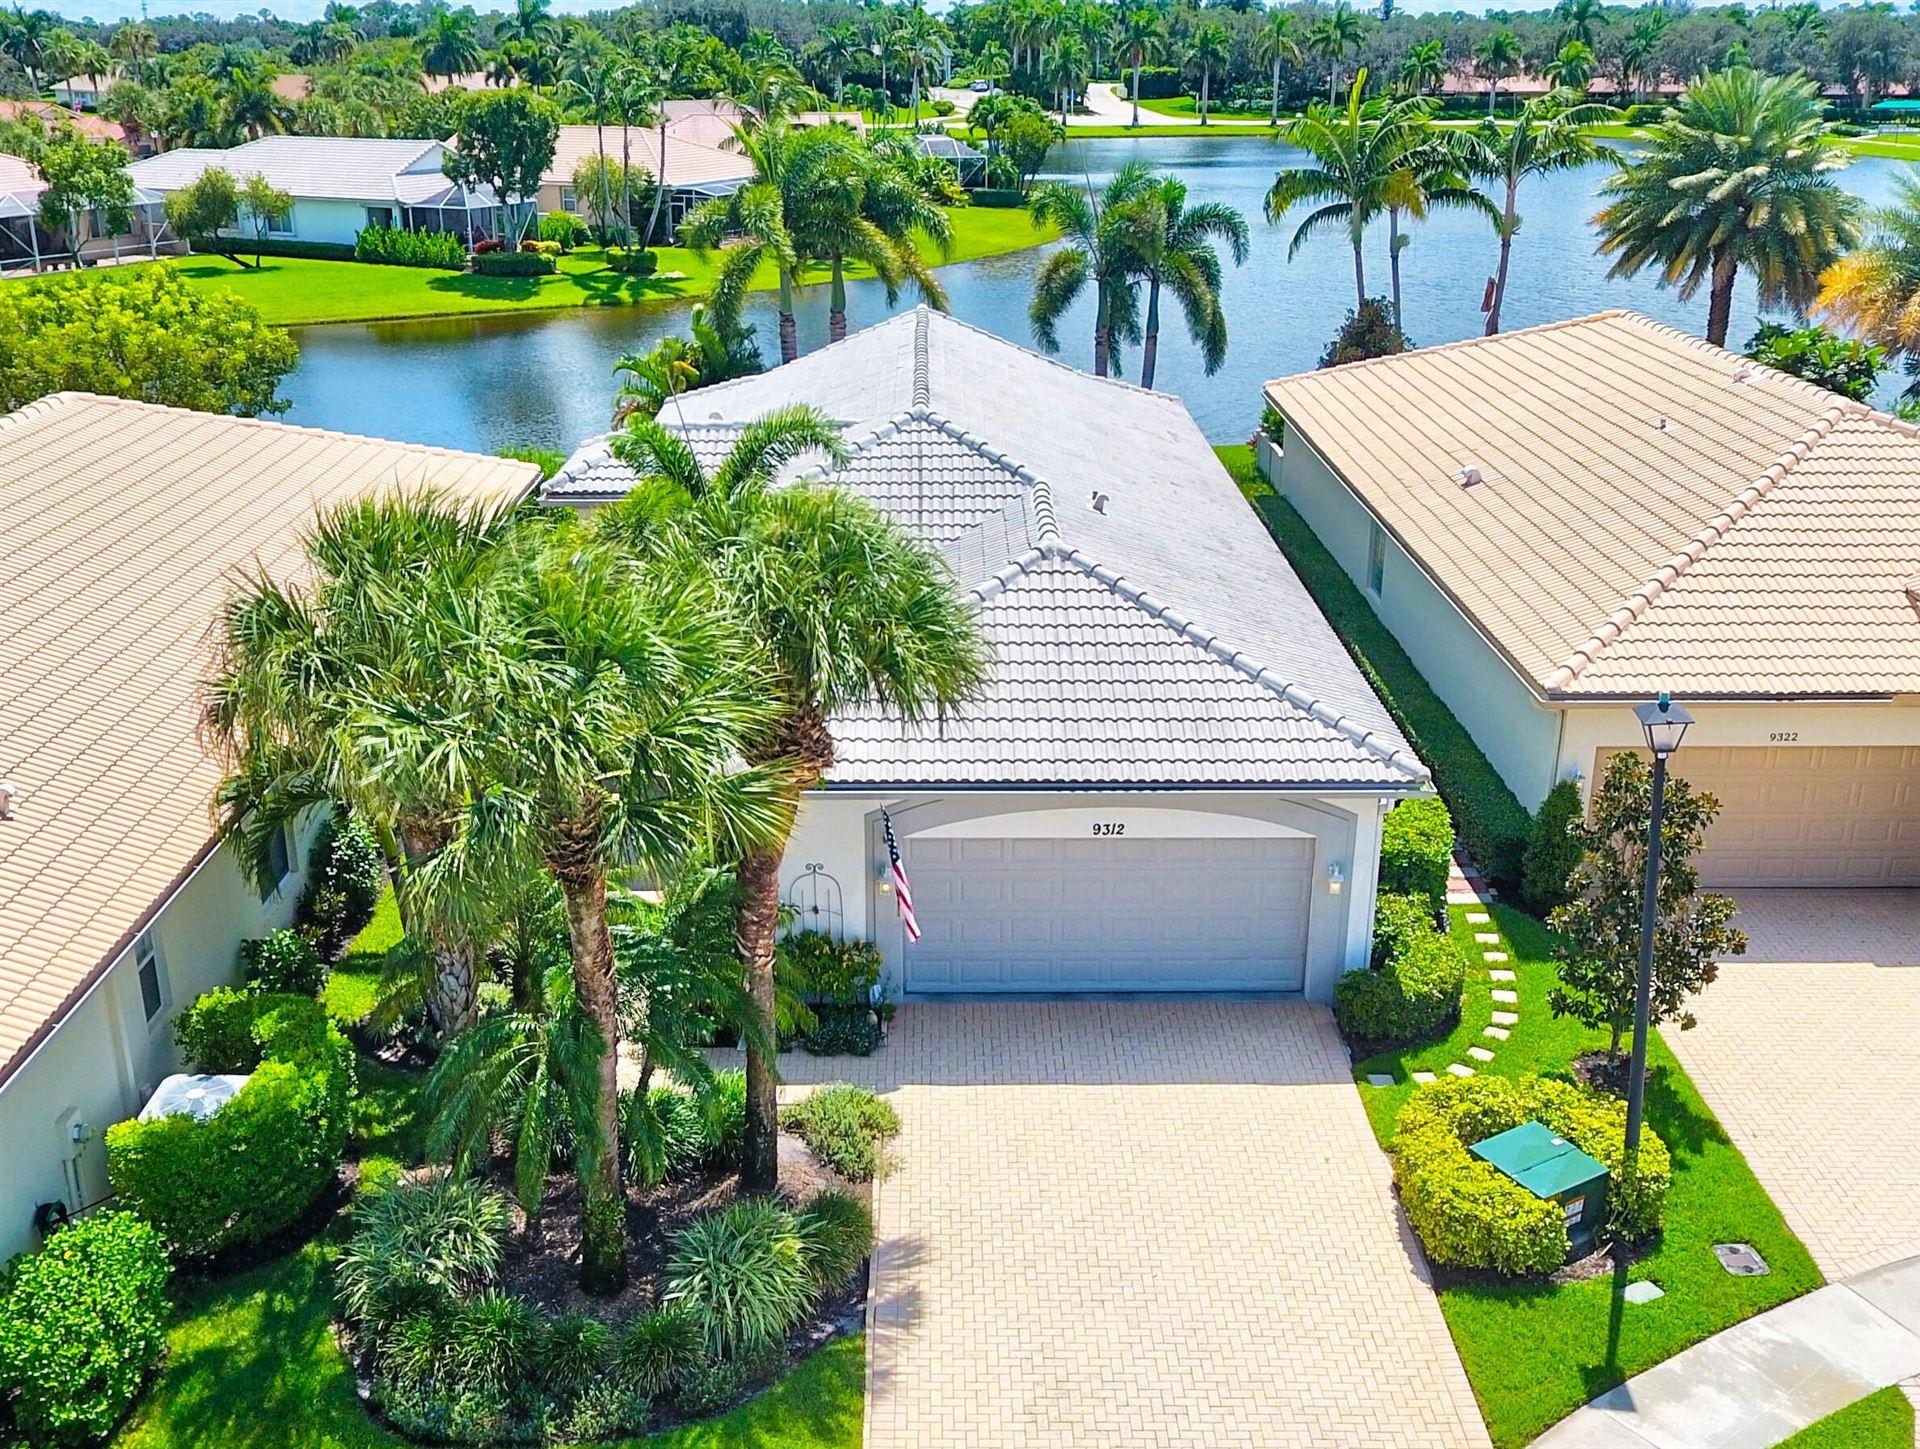 9312 Sapphire Cove Drive, West Palm Beach, FL 33411 - MLS#: RX-10745804